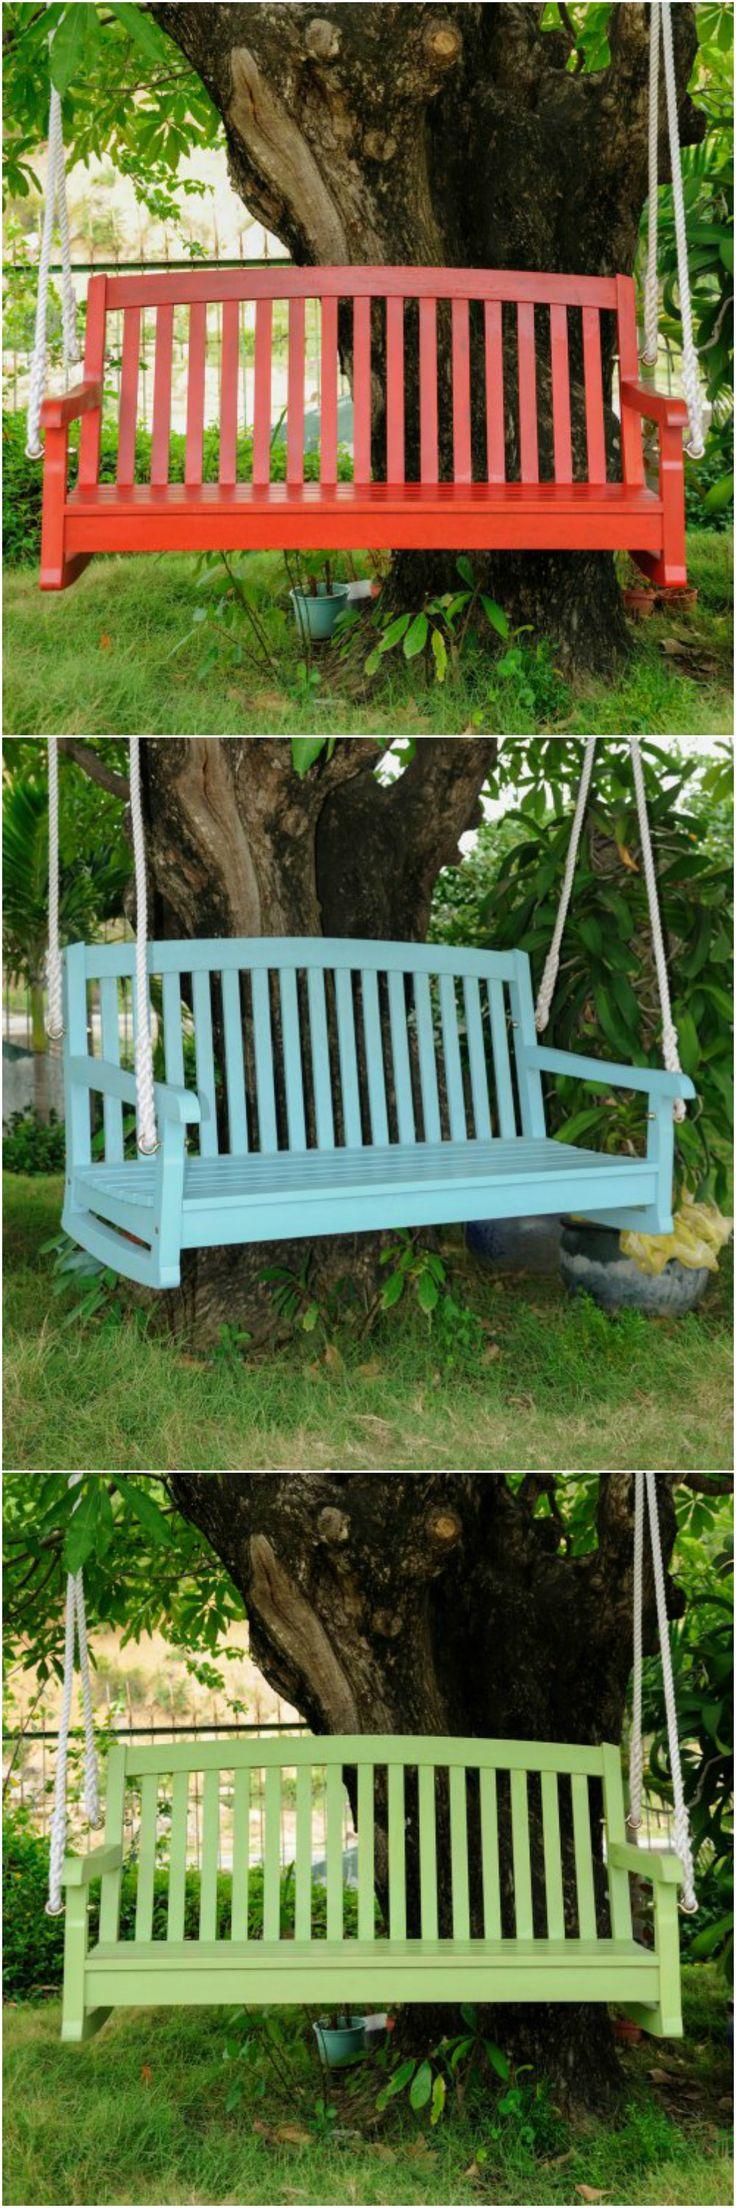 Colored porch swings outdoor living pinterest - Columpios para jardin ...